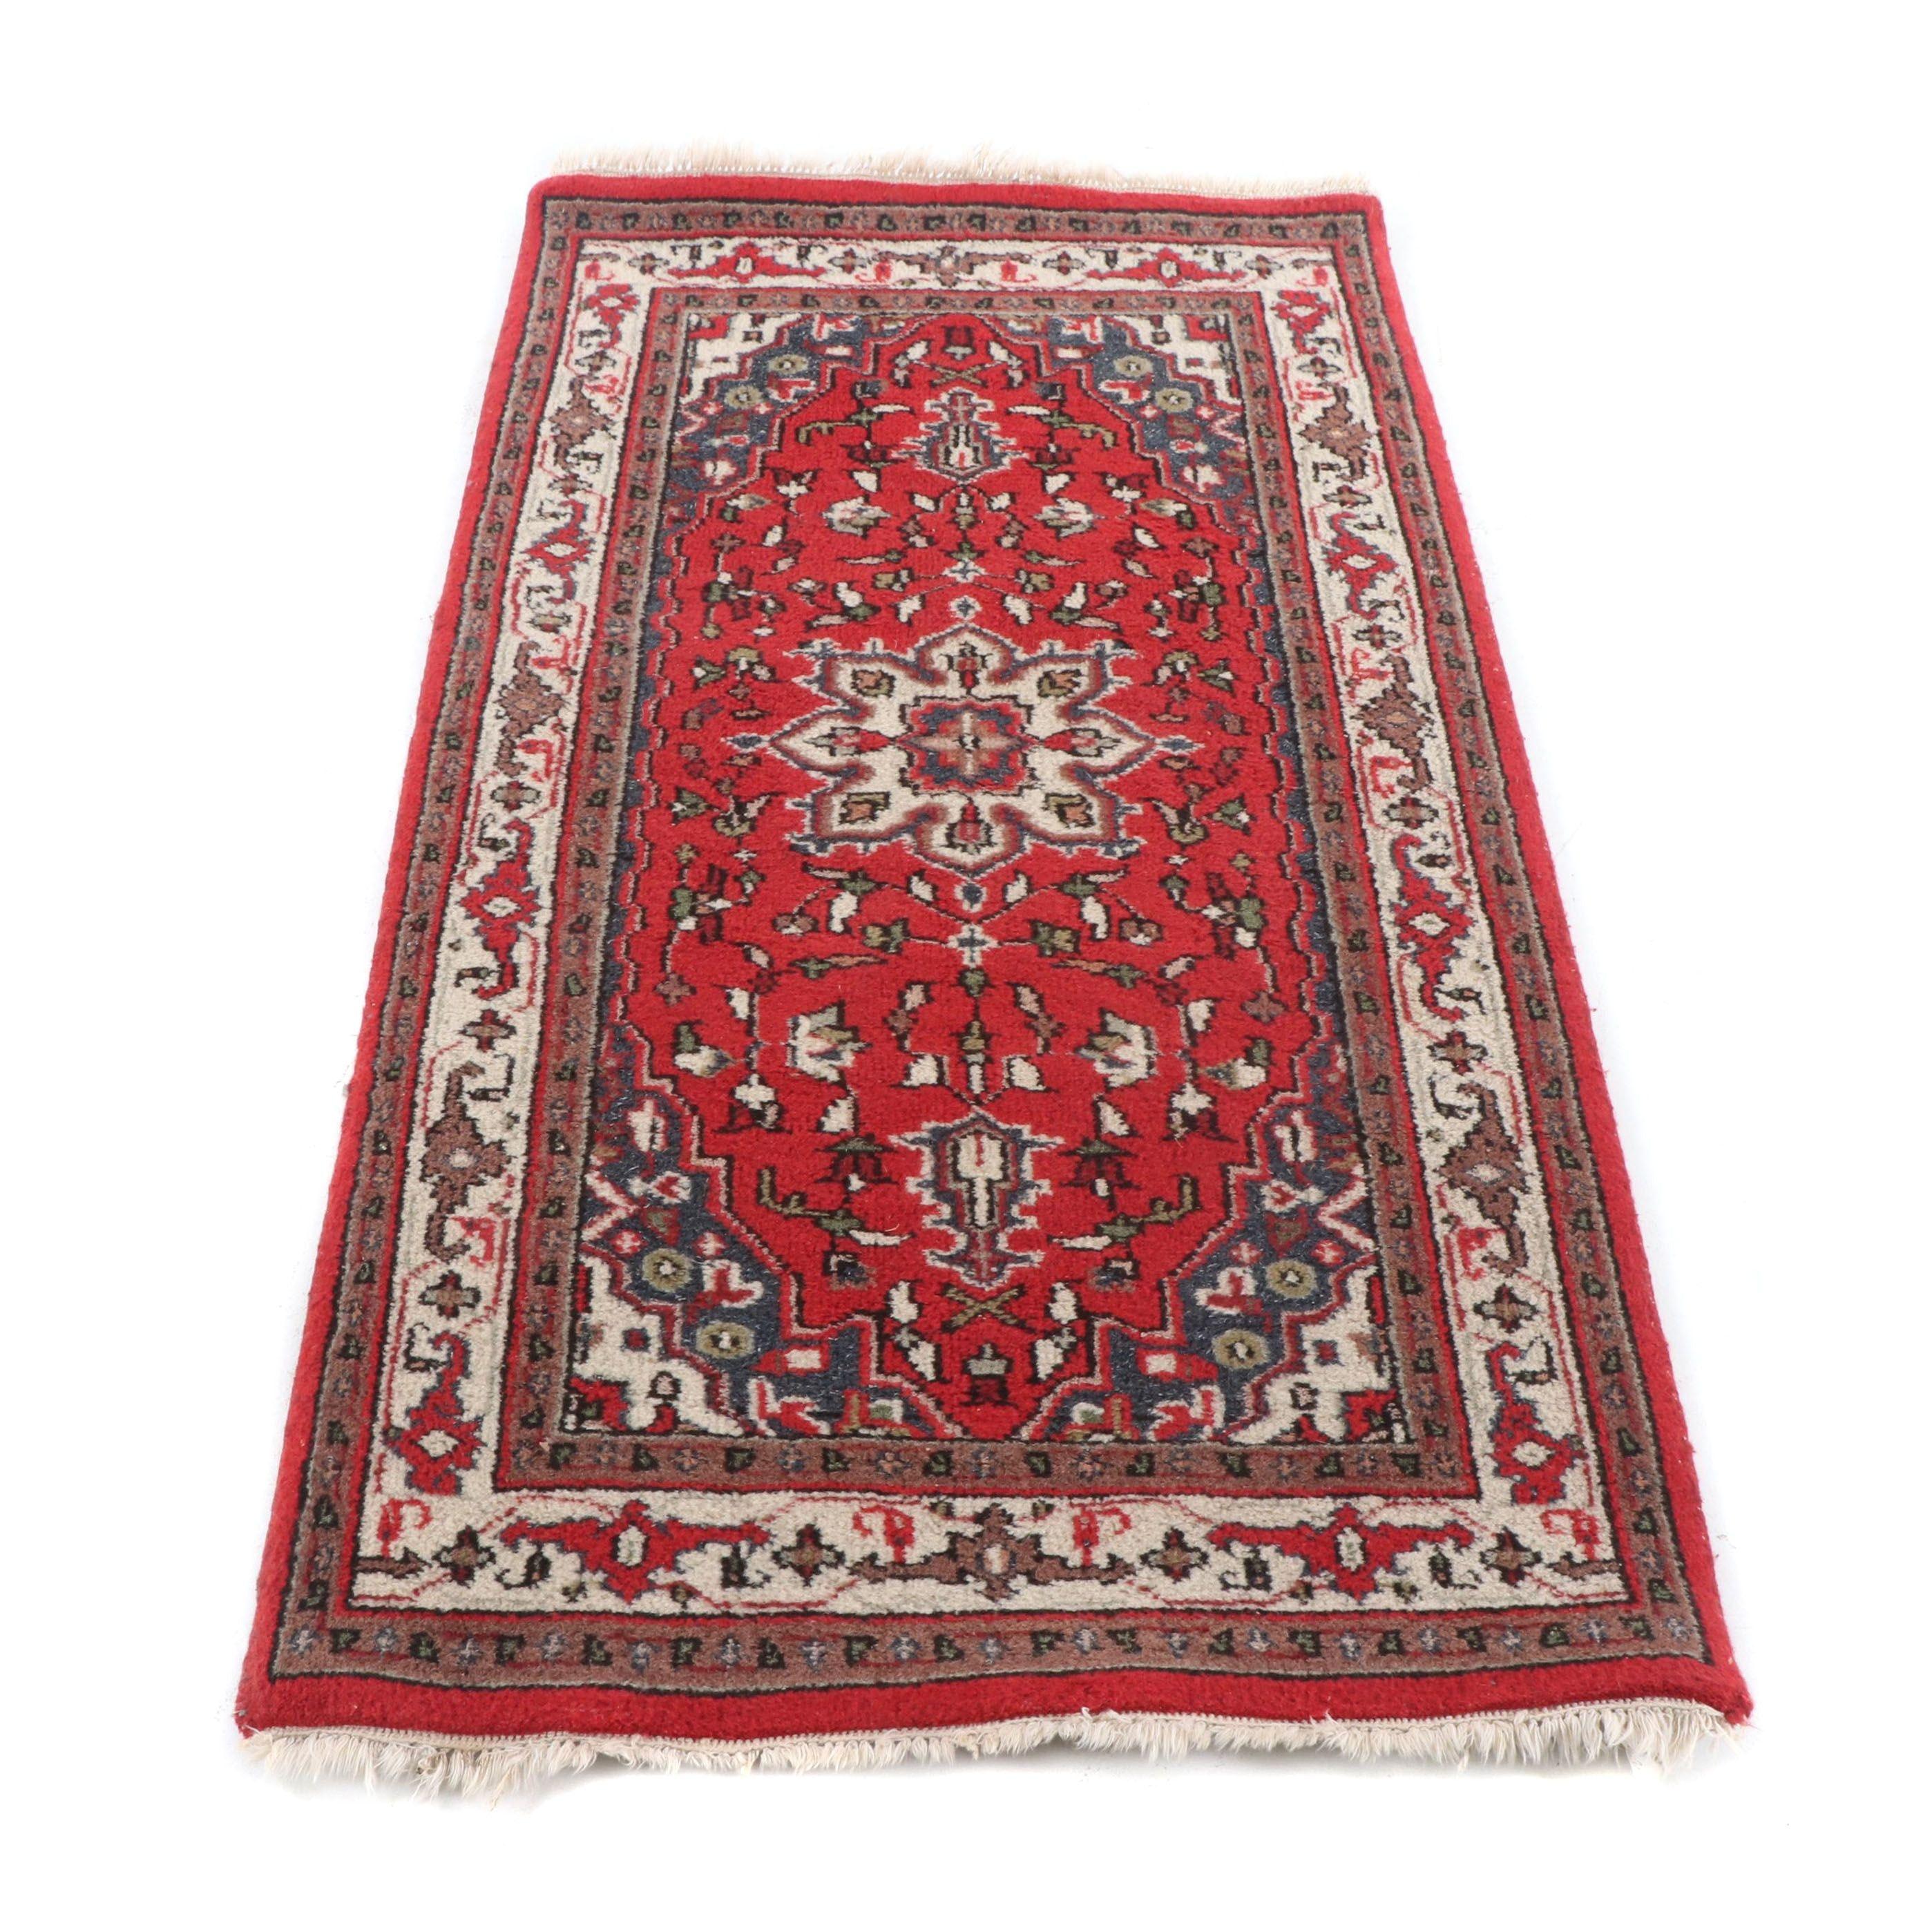 Hand Loomed Indo-Persian Heriz Wool Accent Rug